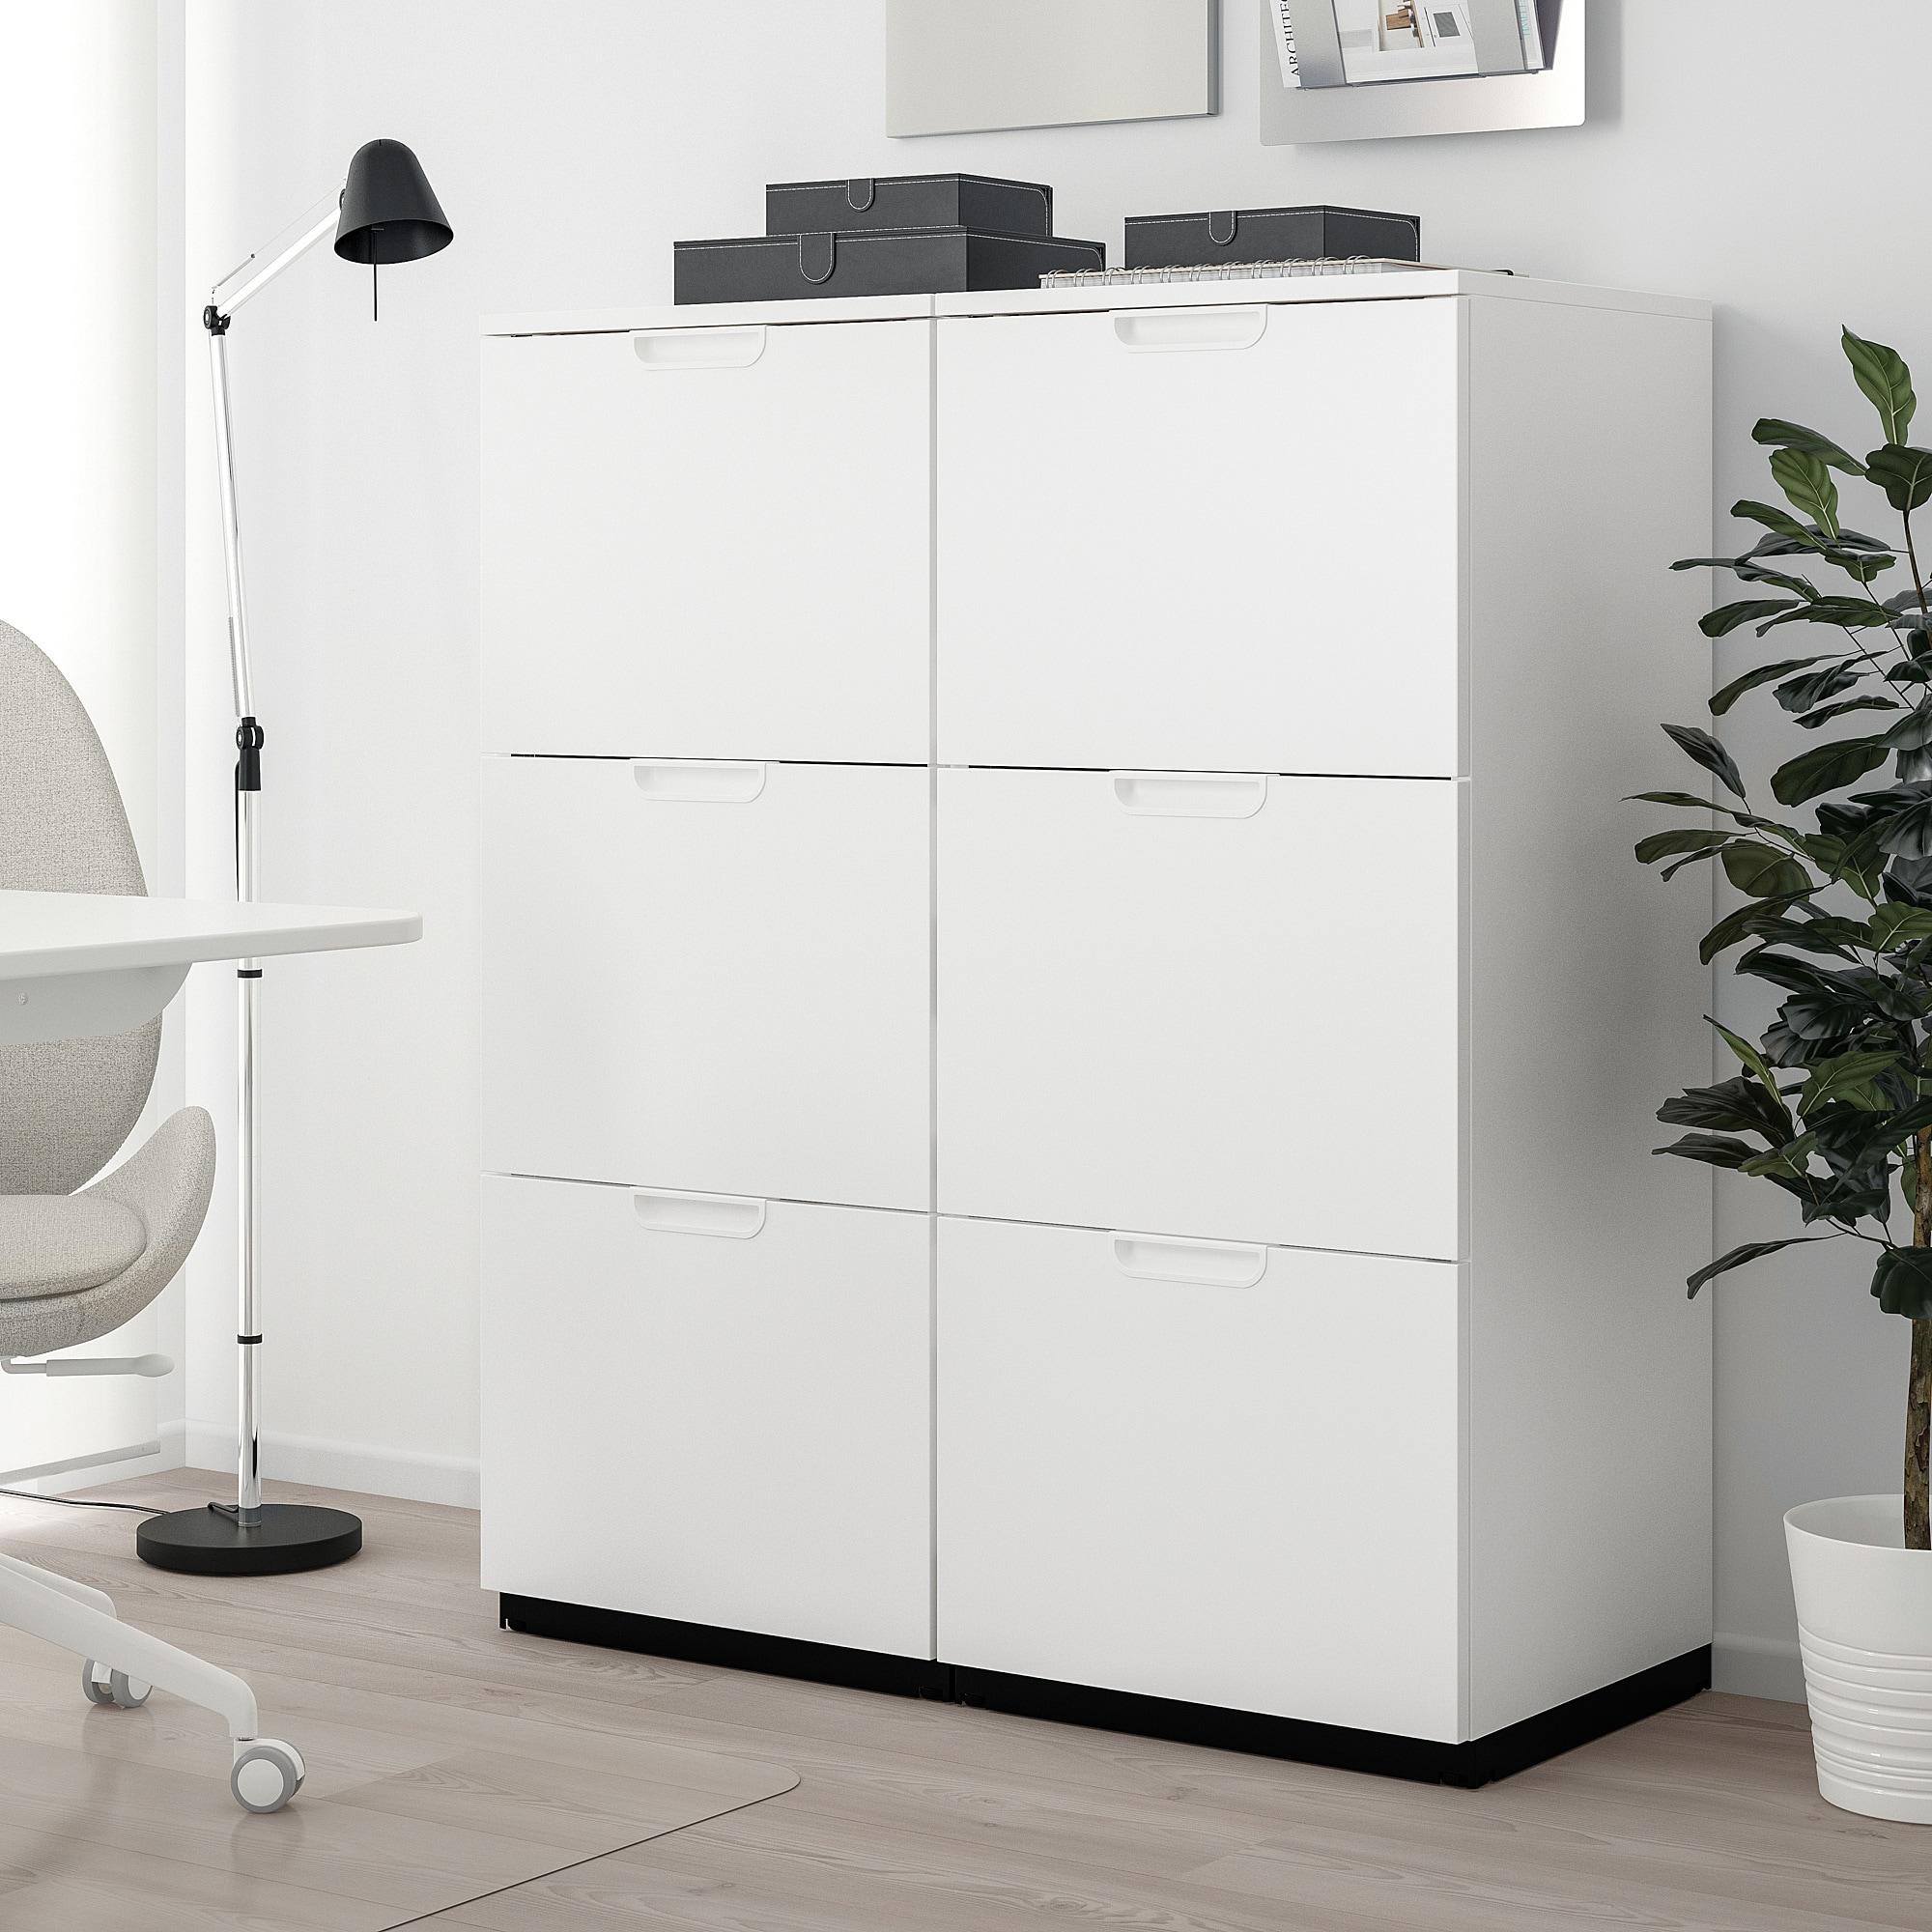 Ikea Filing Cabinets Canada